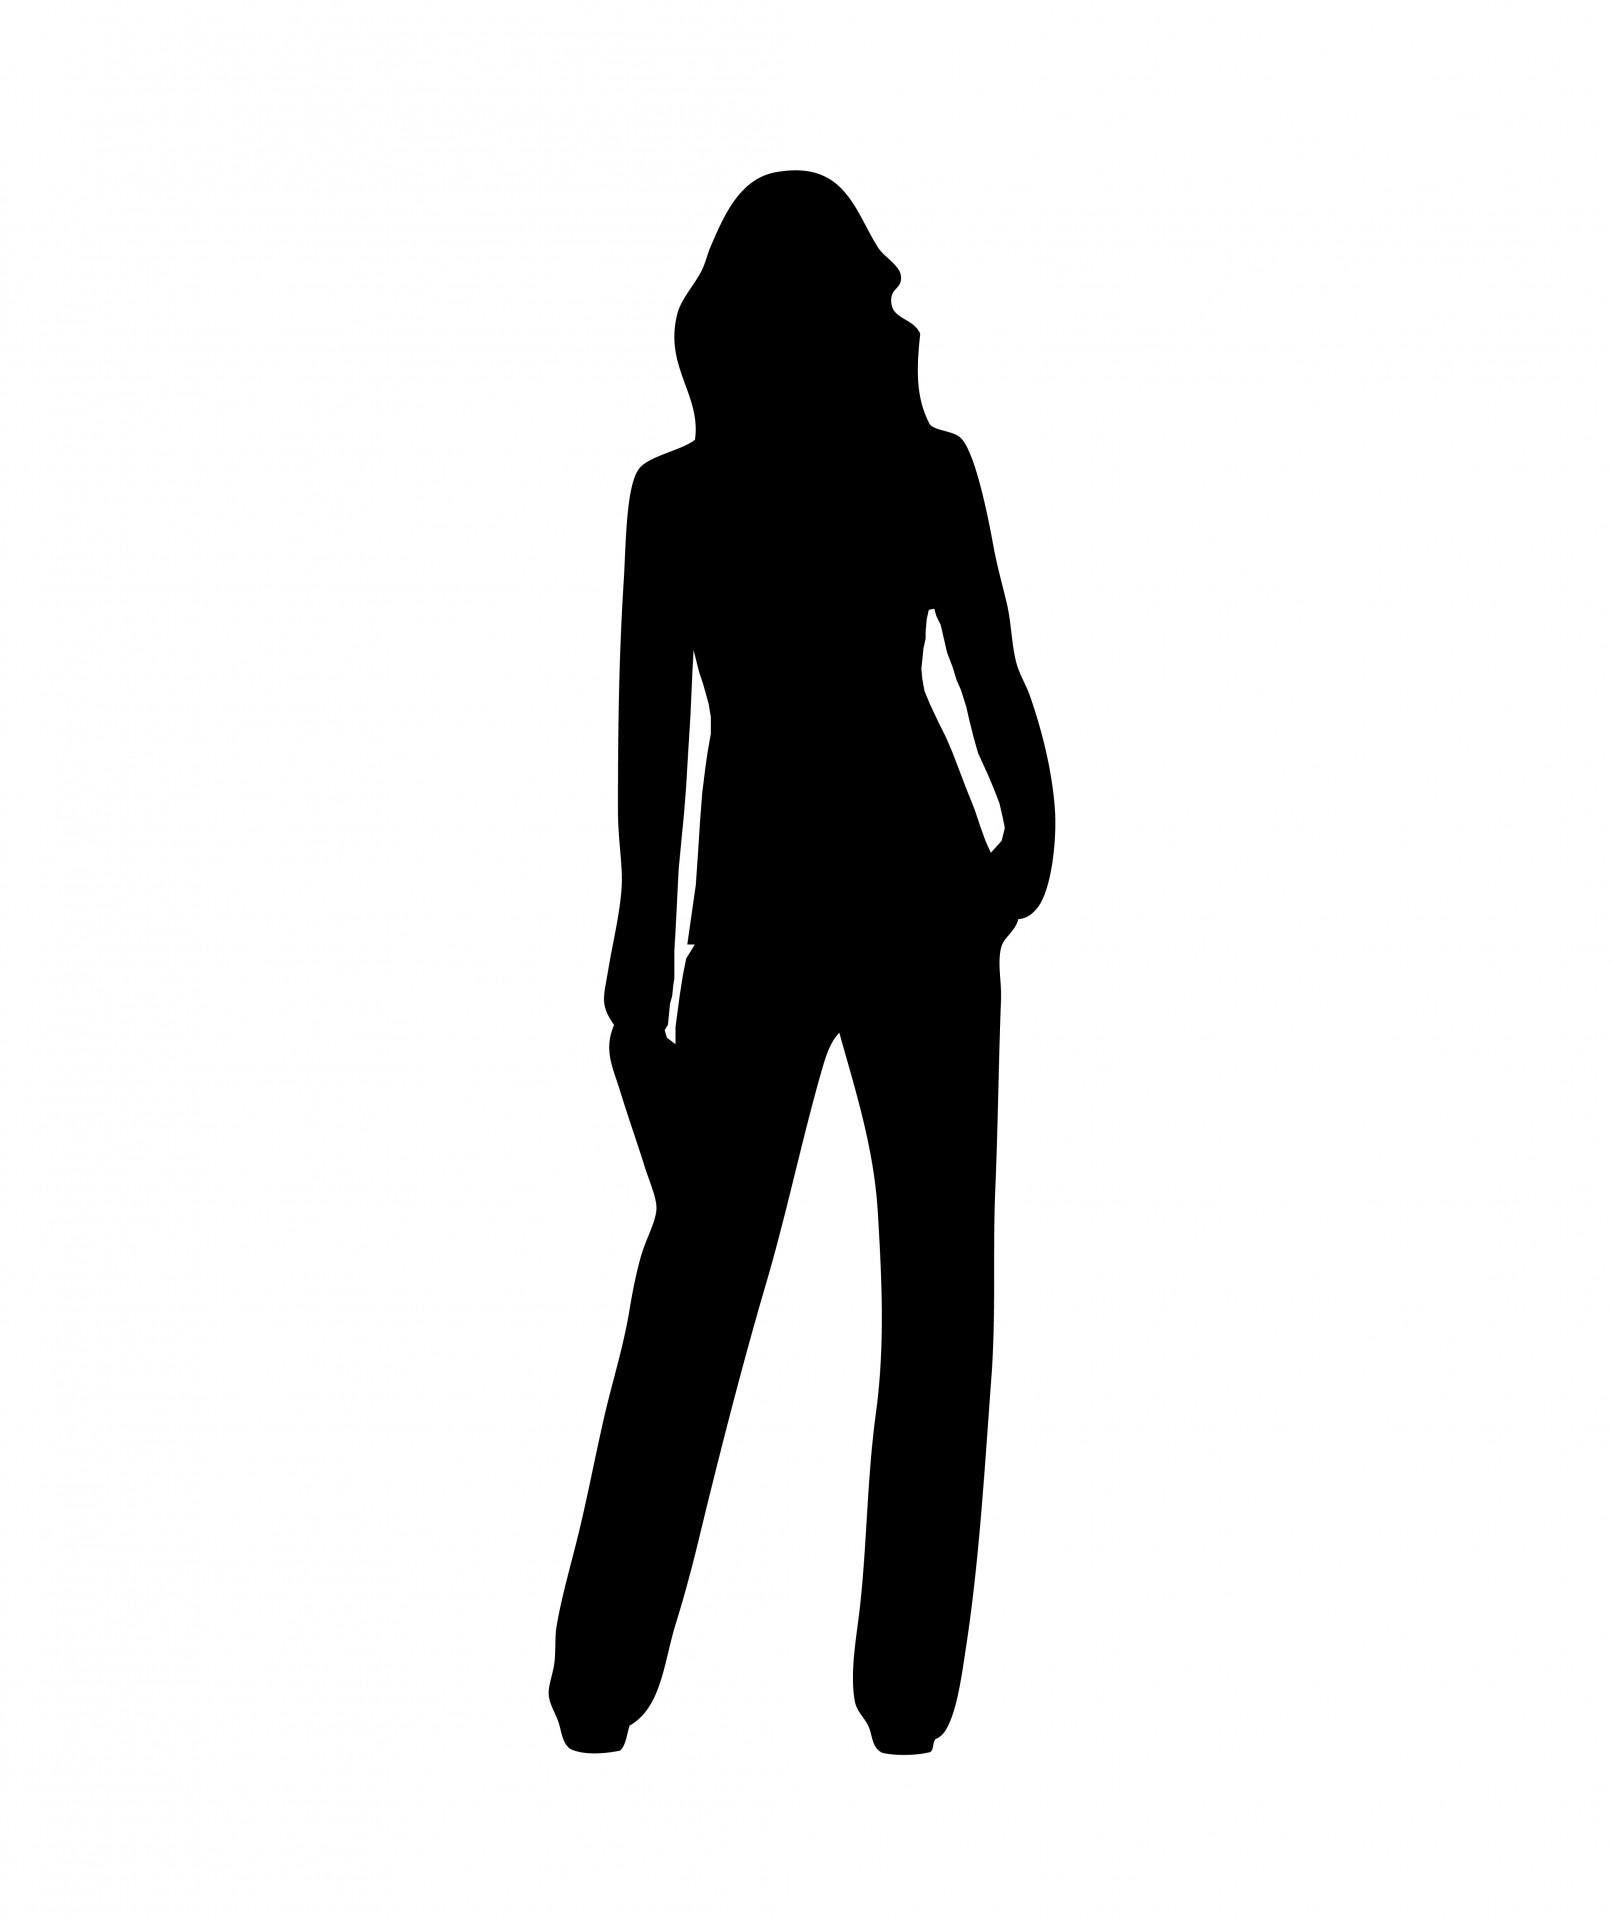 1612x1920 Woman Silhouette Free Stock Photo